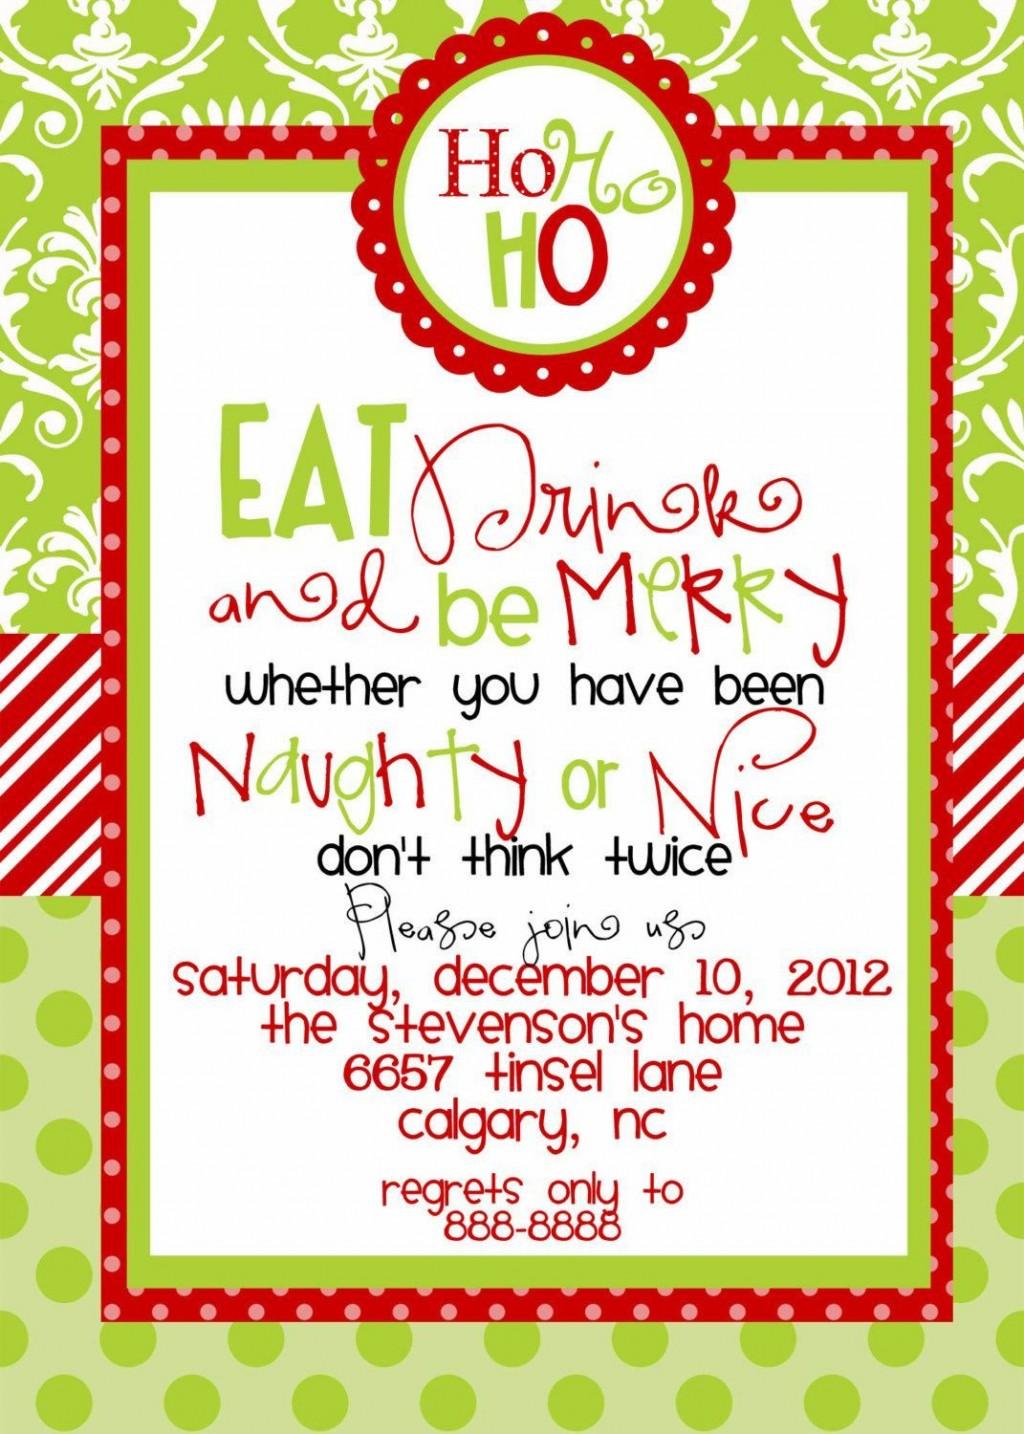 002 Rare Office Christma Party Invitation Wording Sample Photo  Holiday ExampleLarge